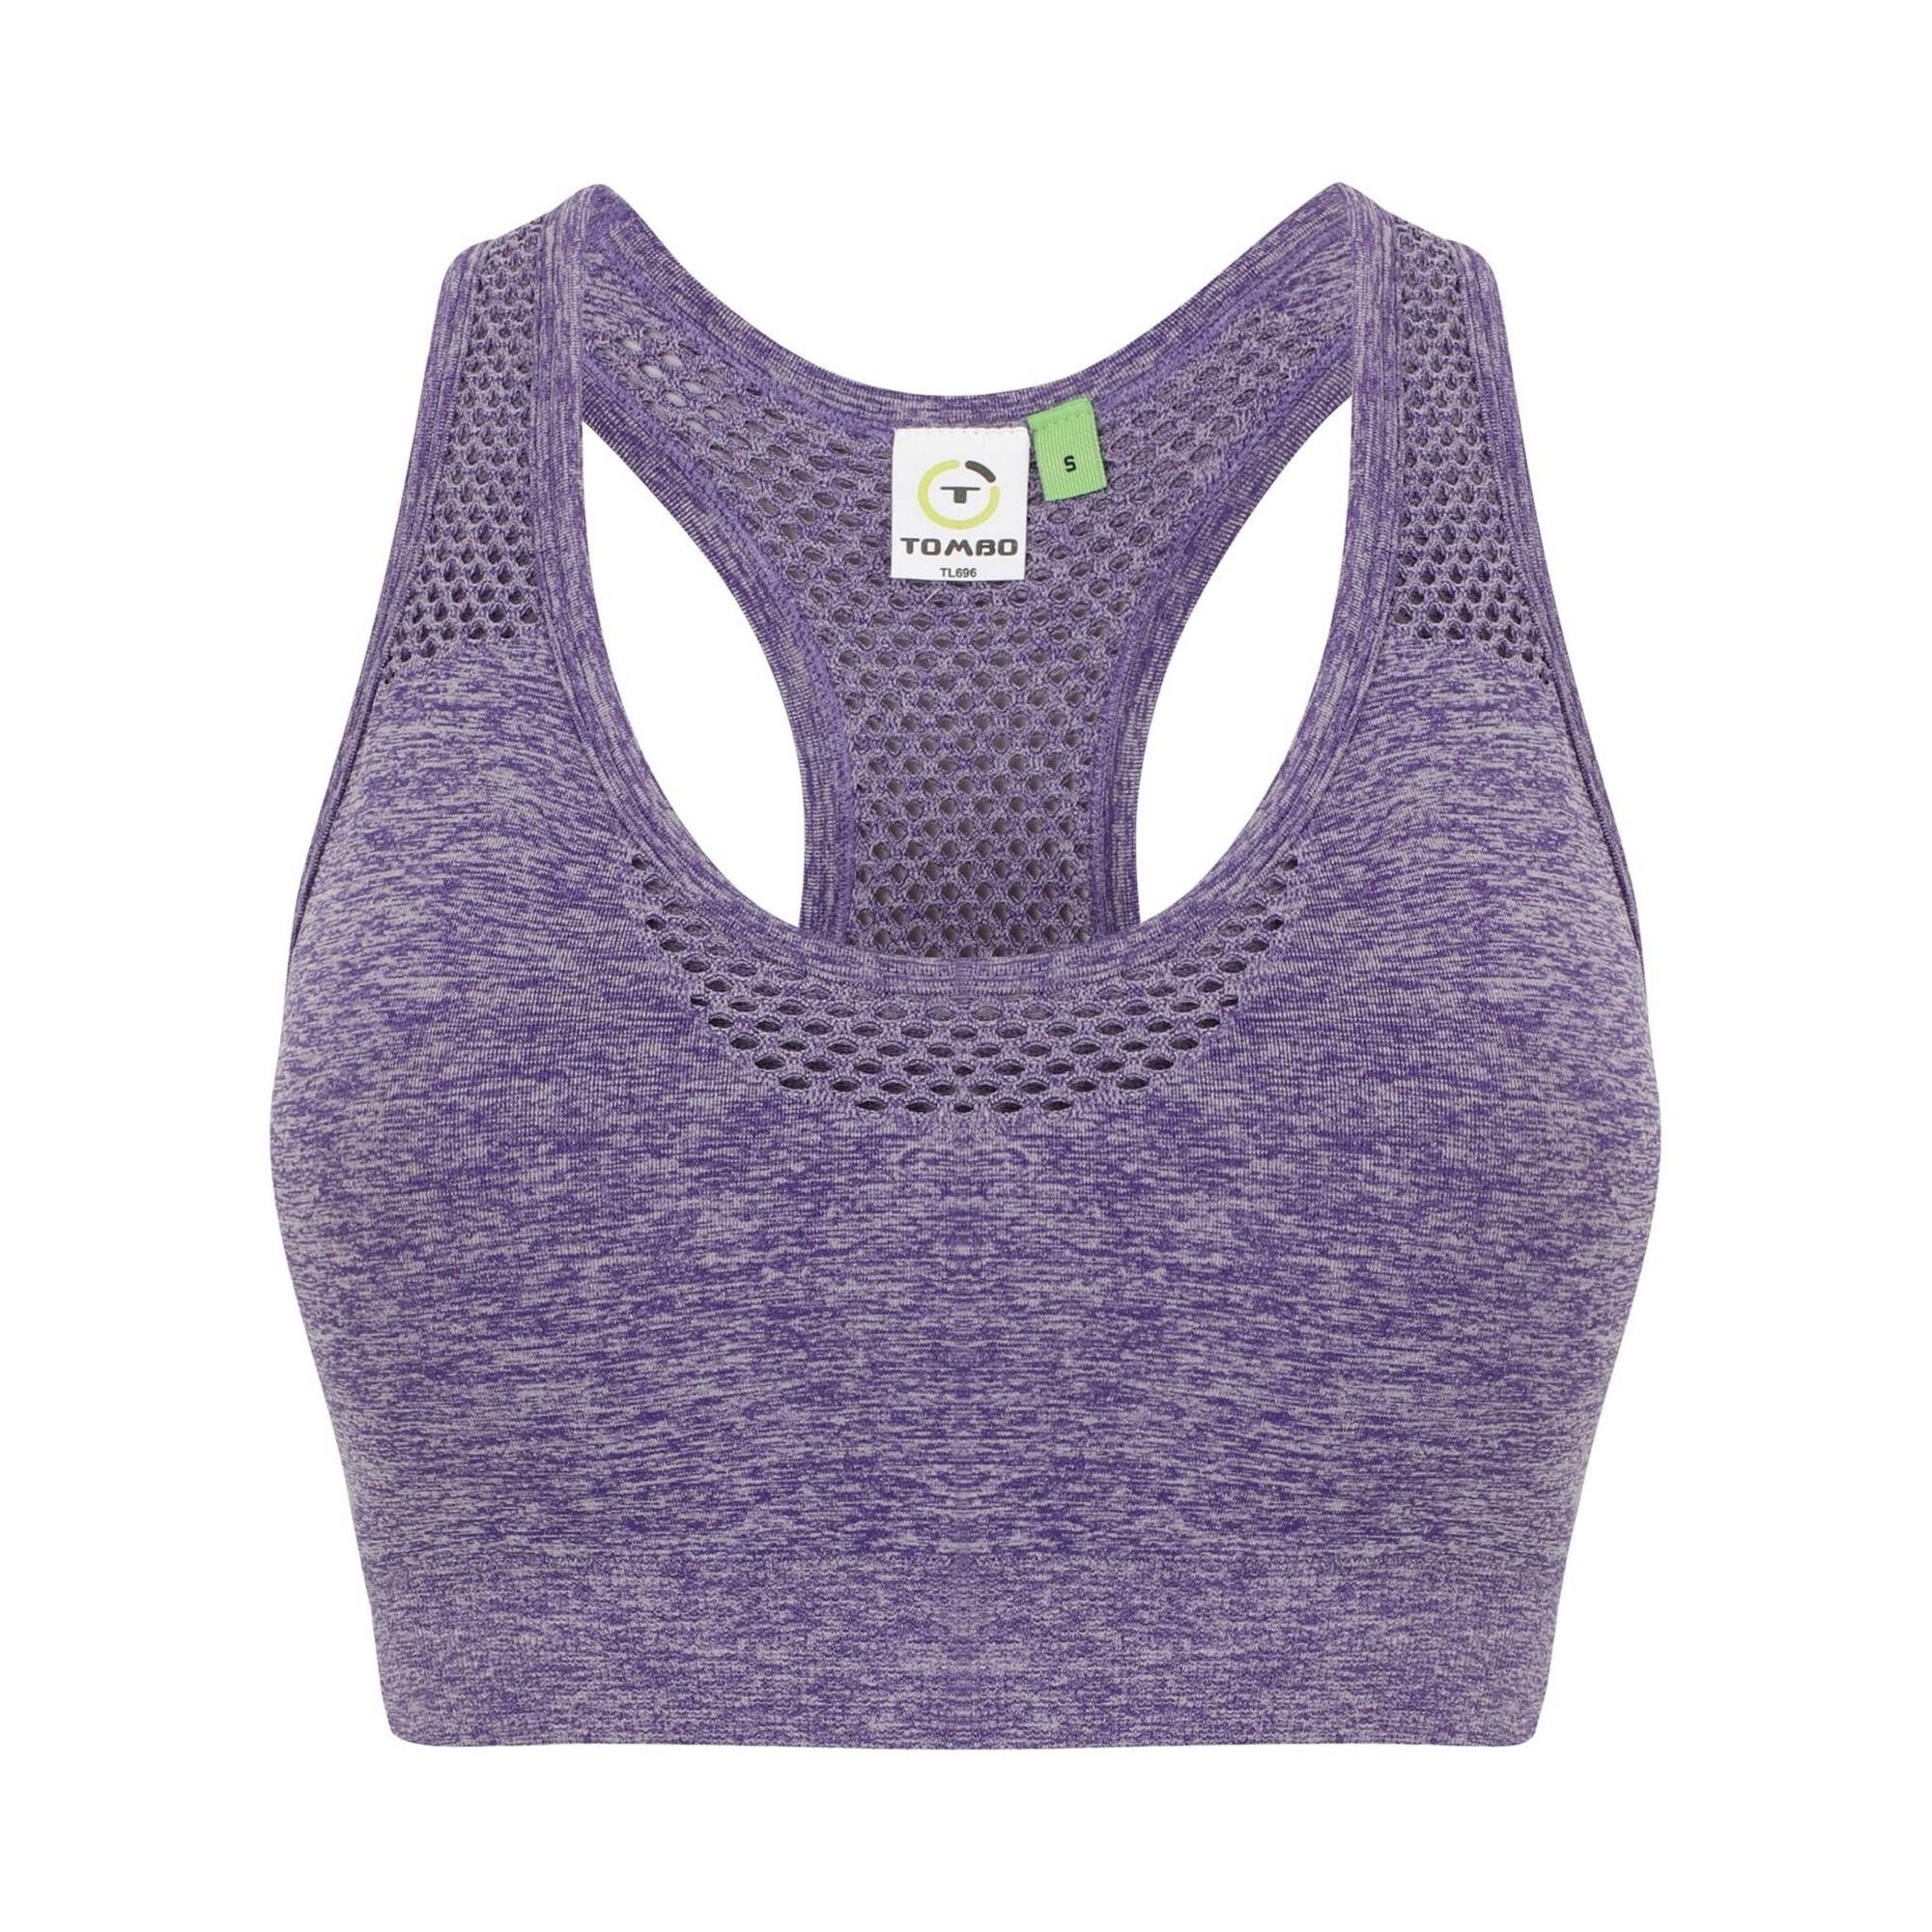 Tombo-Top-corto-sin-costuras-para-mujer-PC3046